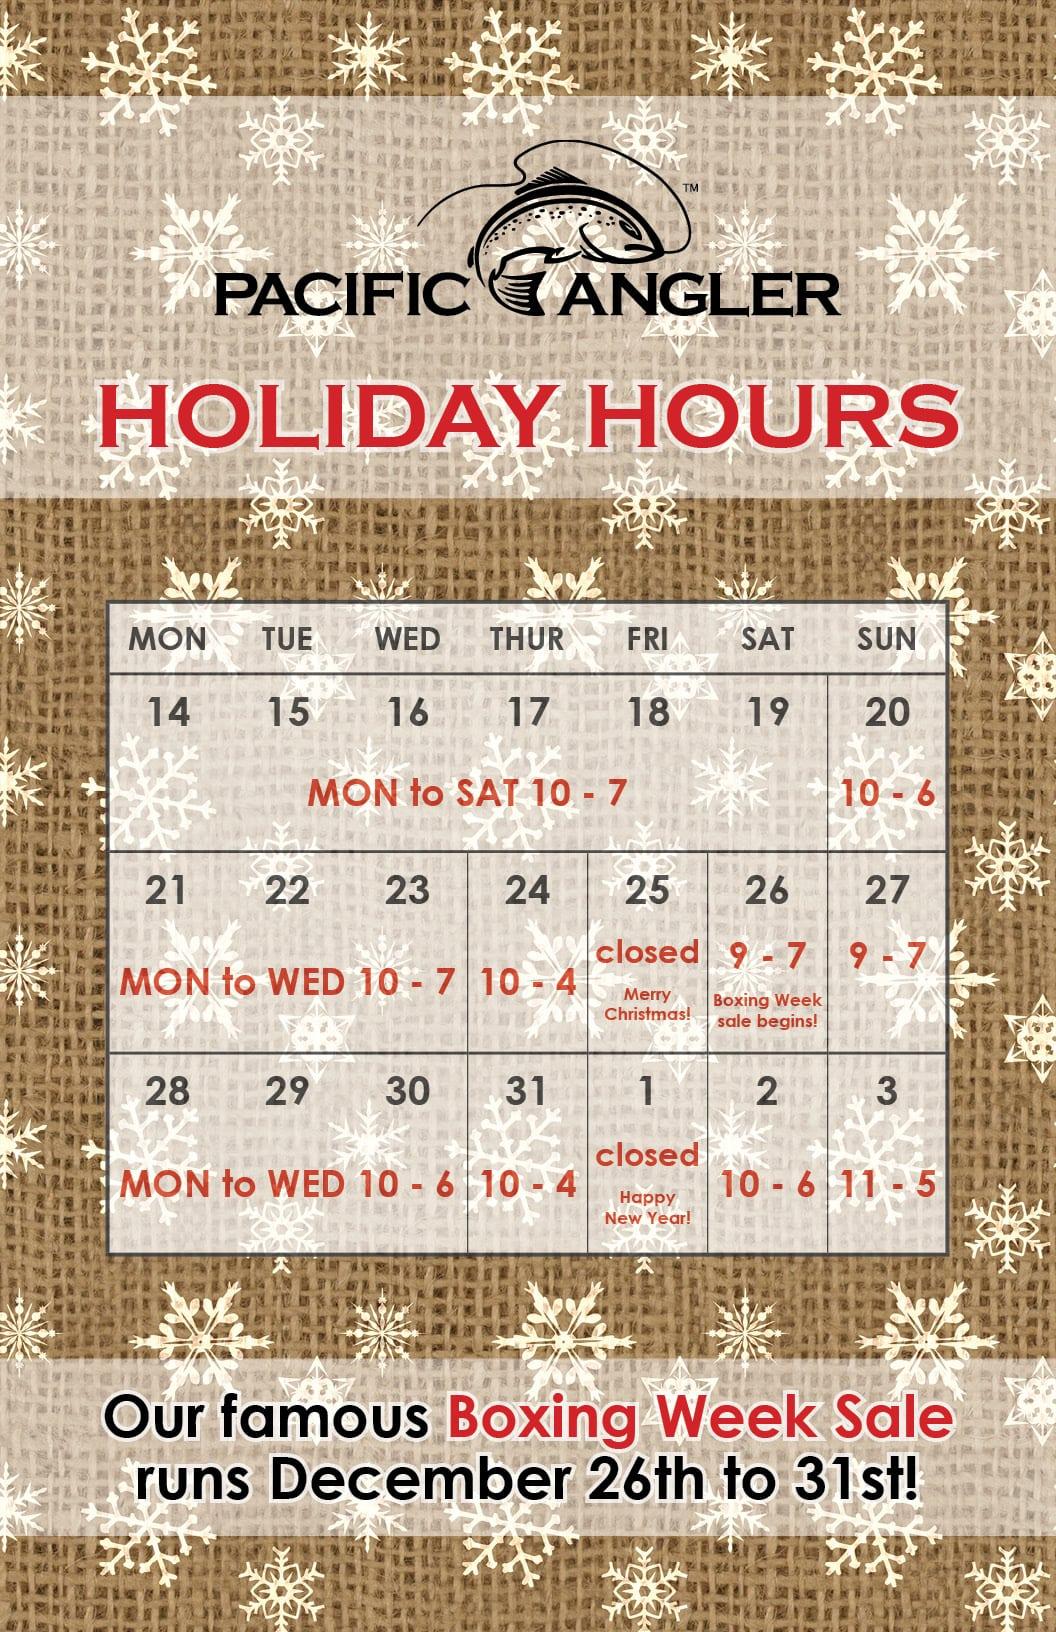 PacAng holiday 2015 - holiday hours